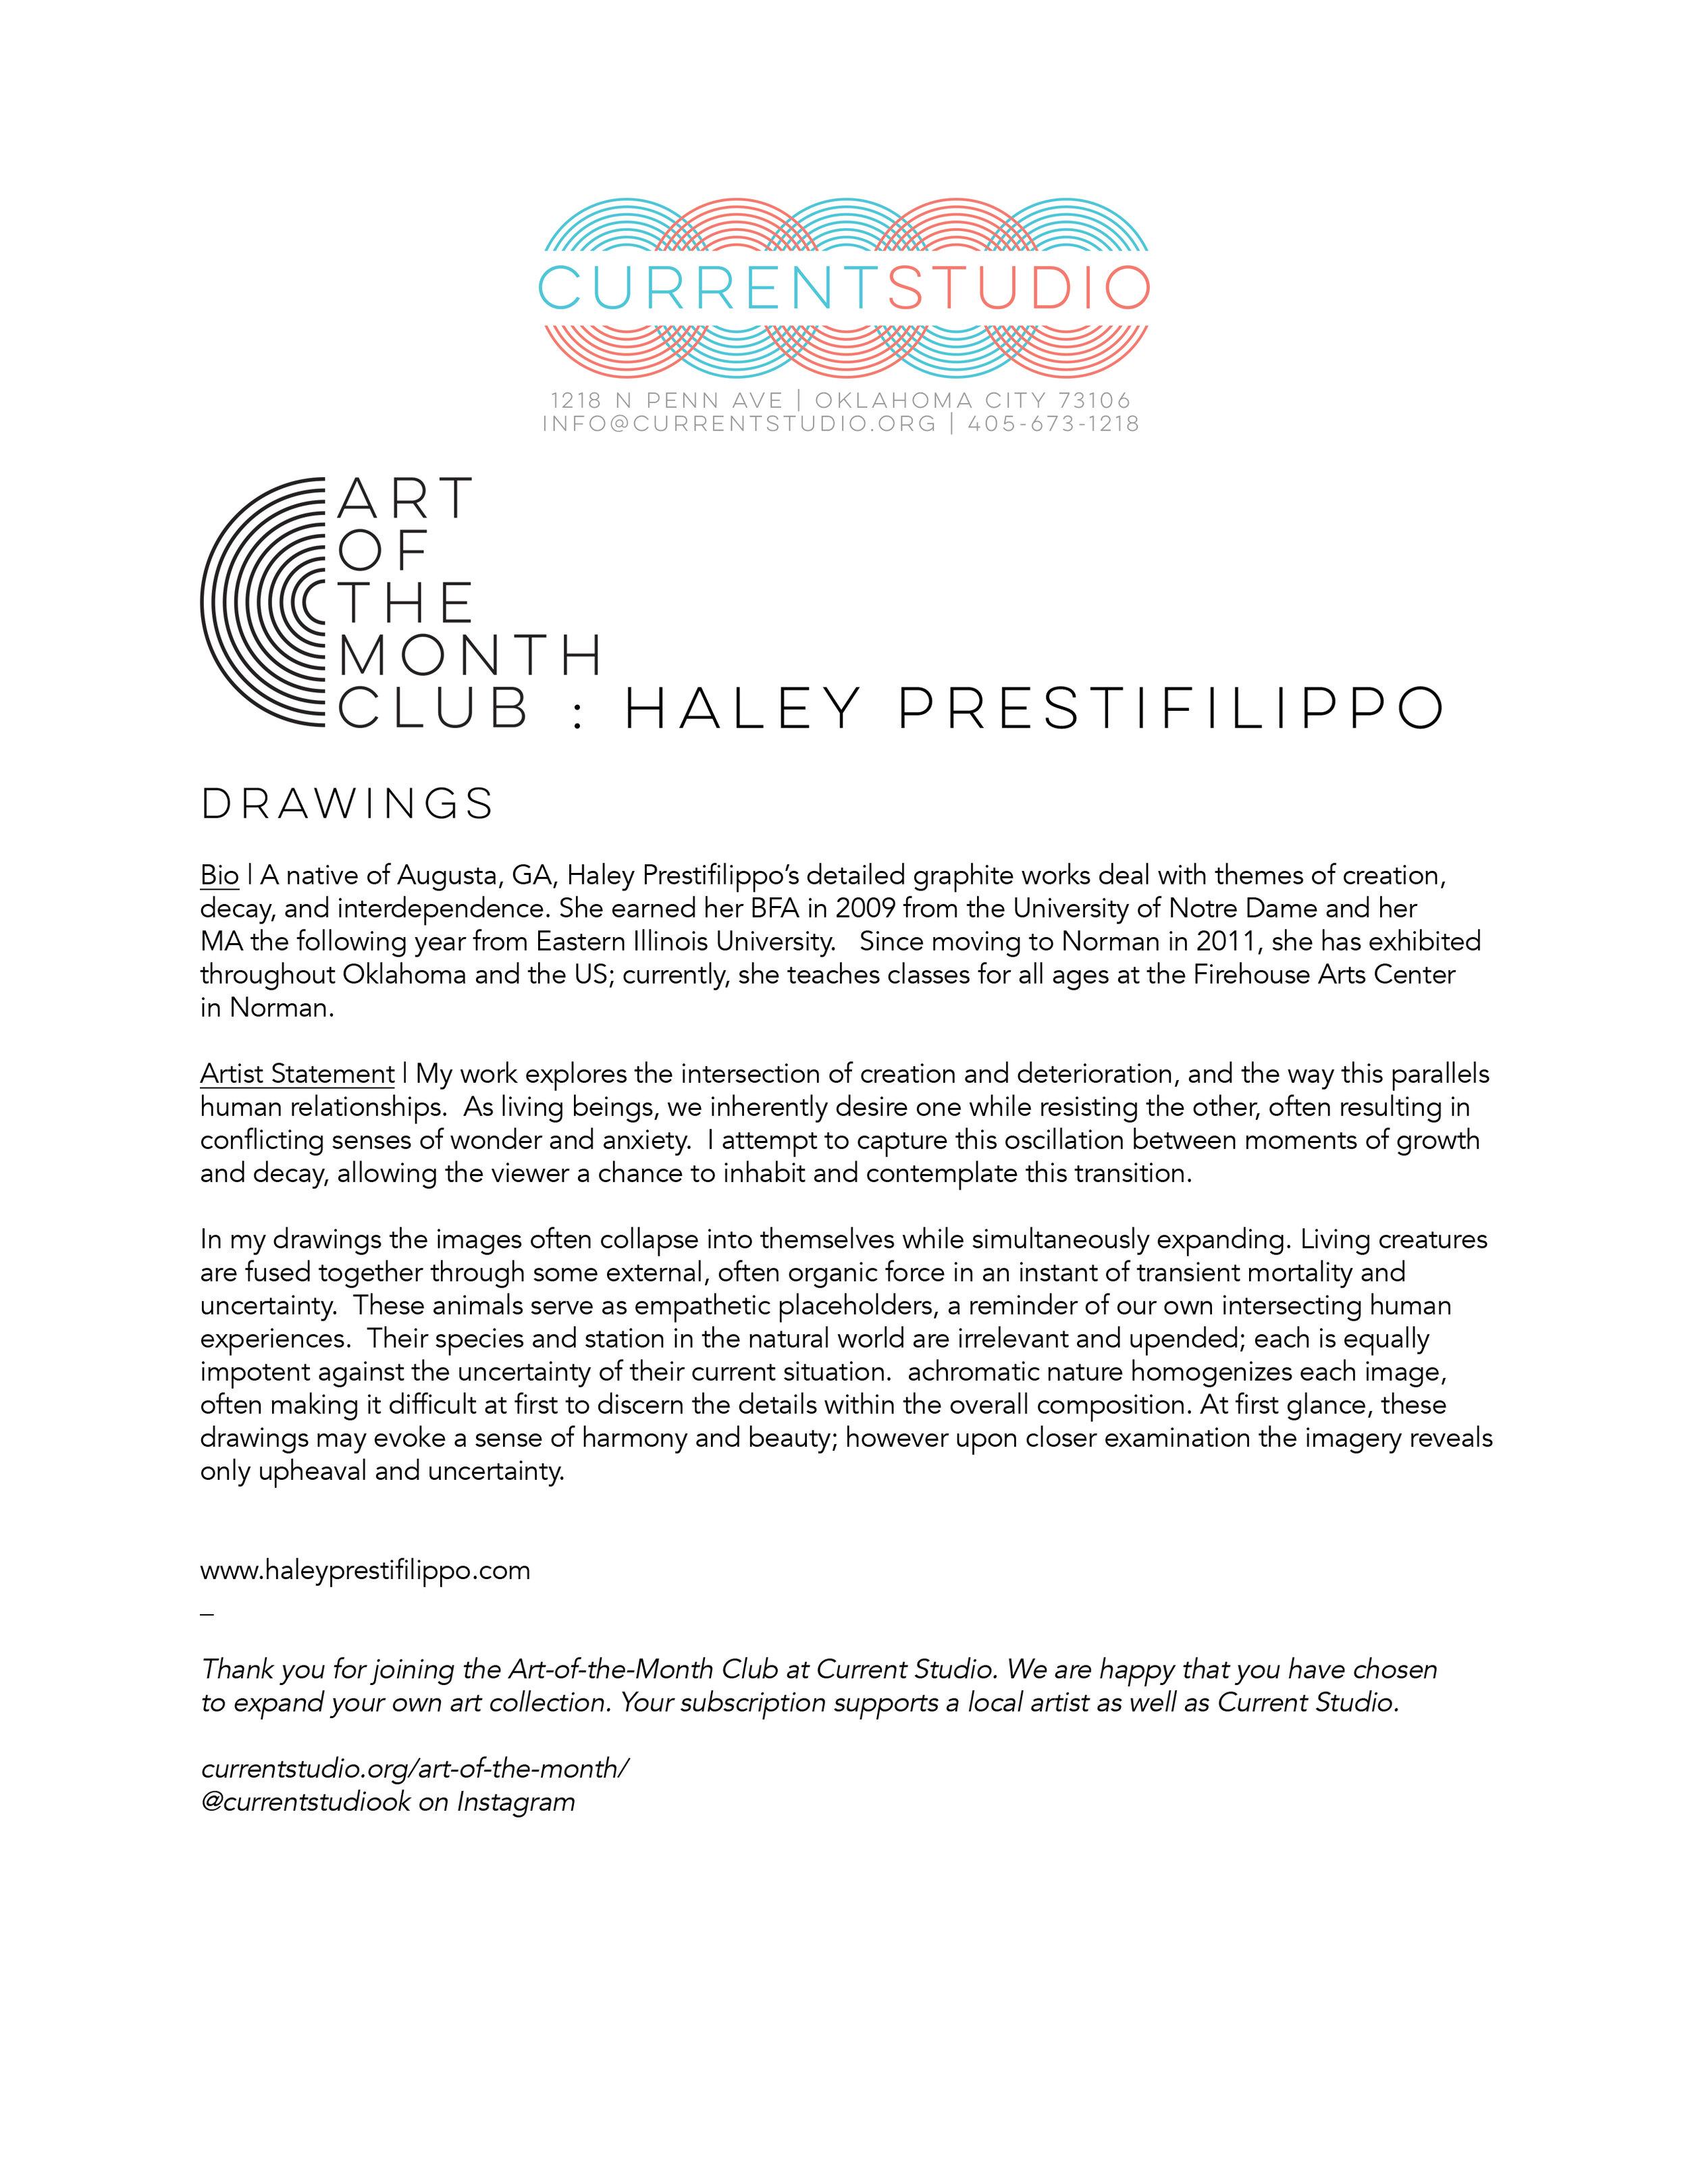 art of the month artist sheet - haley prestifilippo.jpg